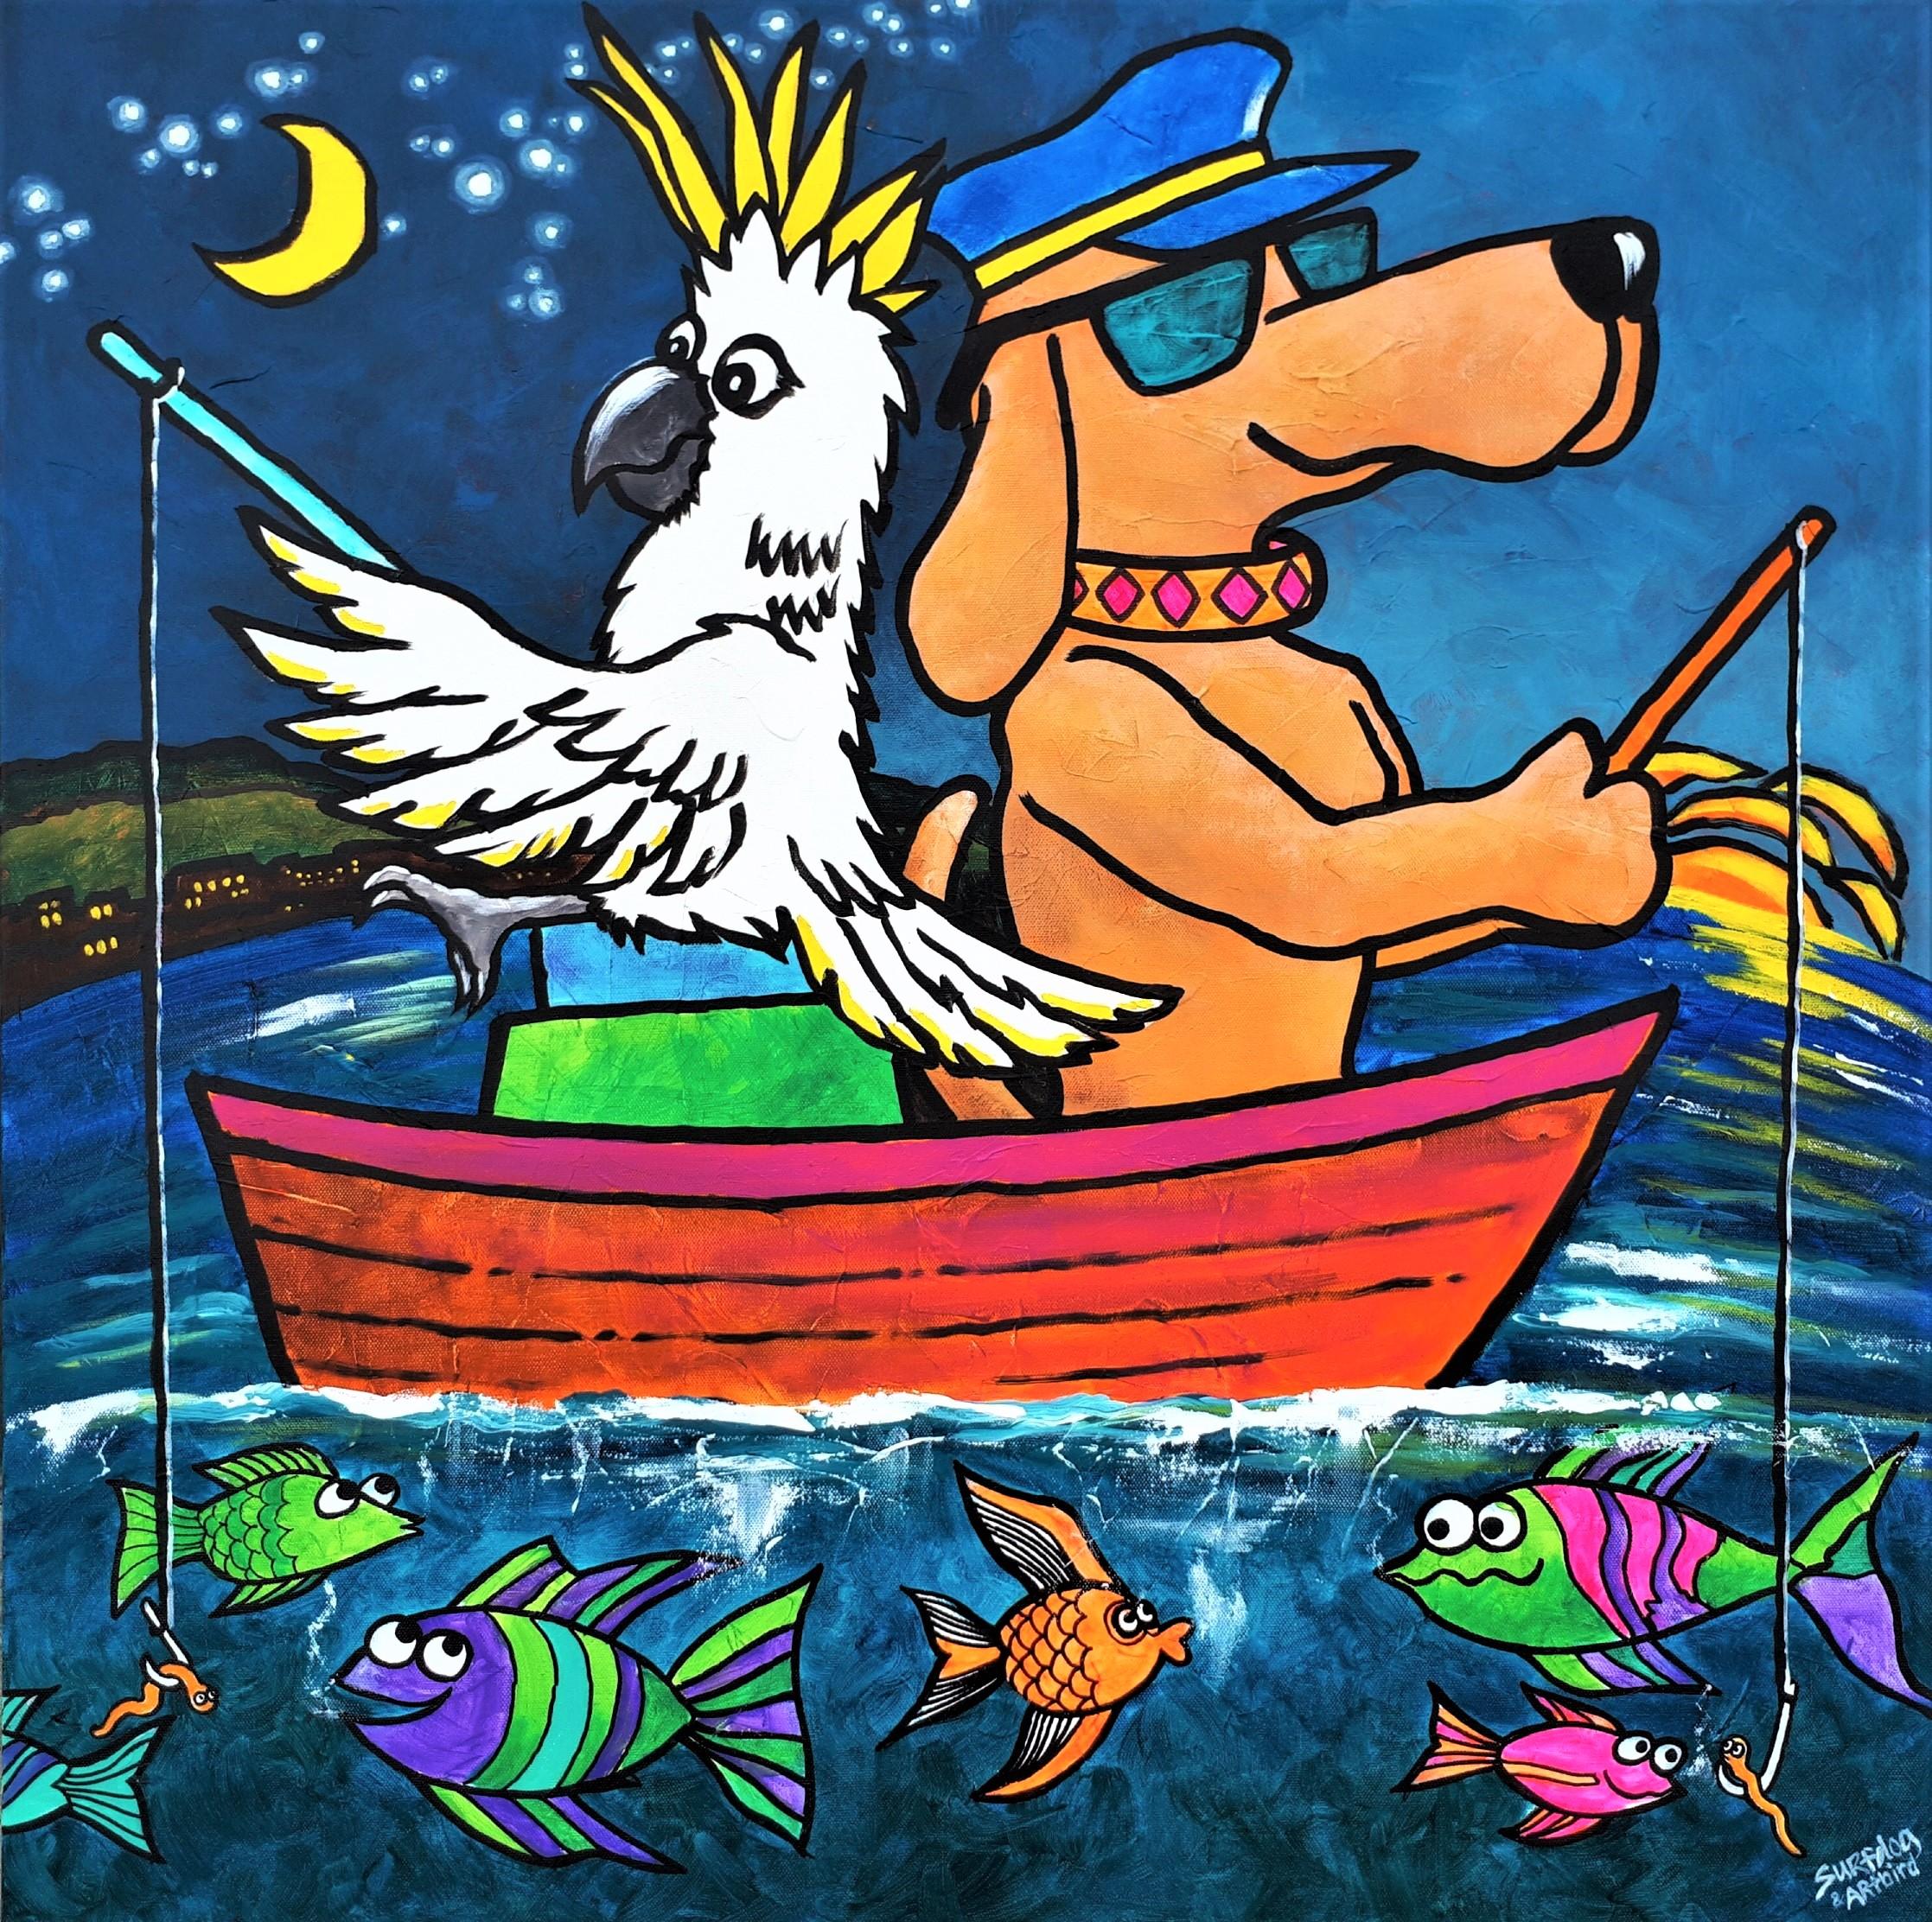 Surfdog and Artbird